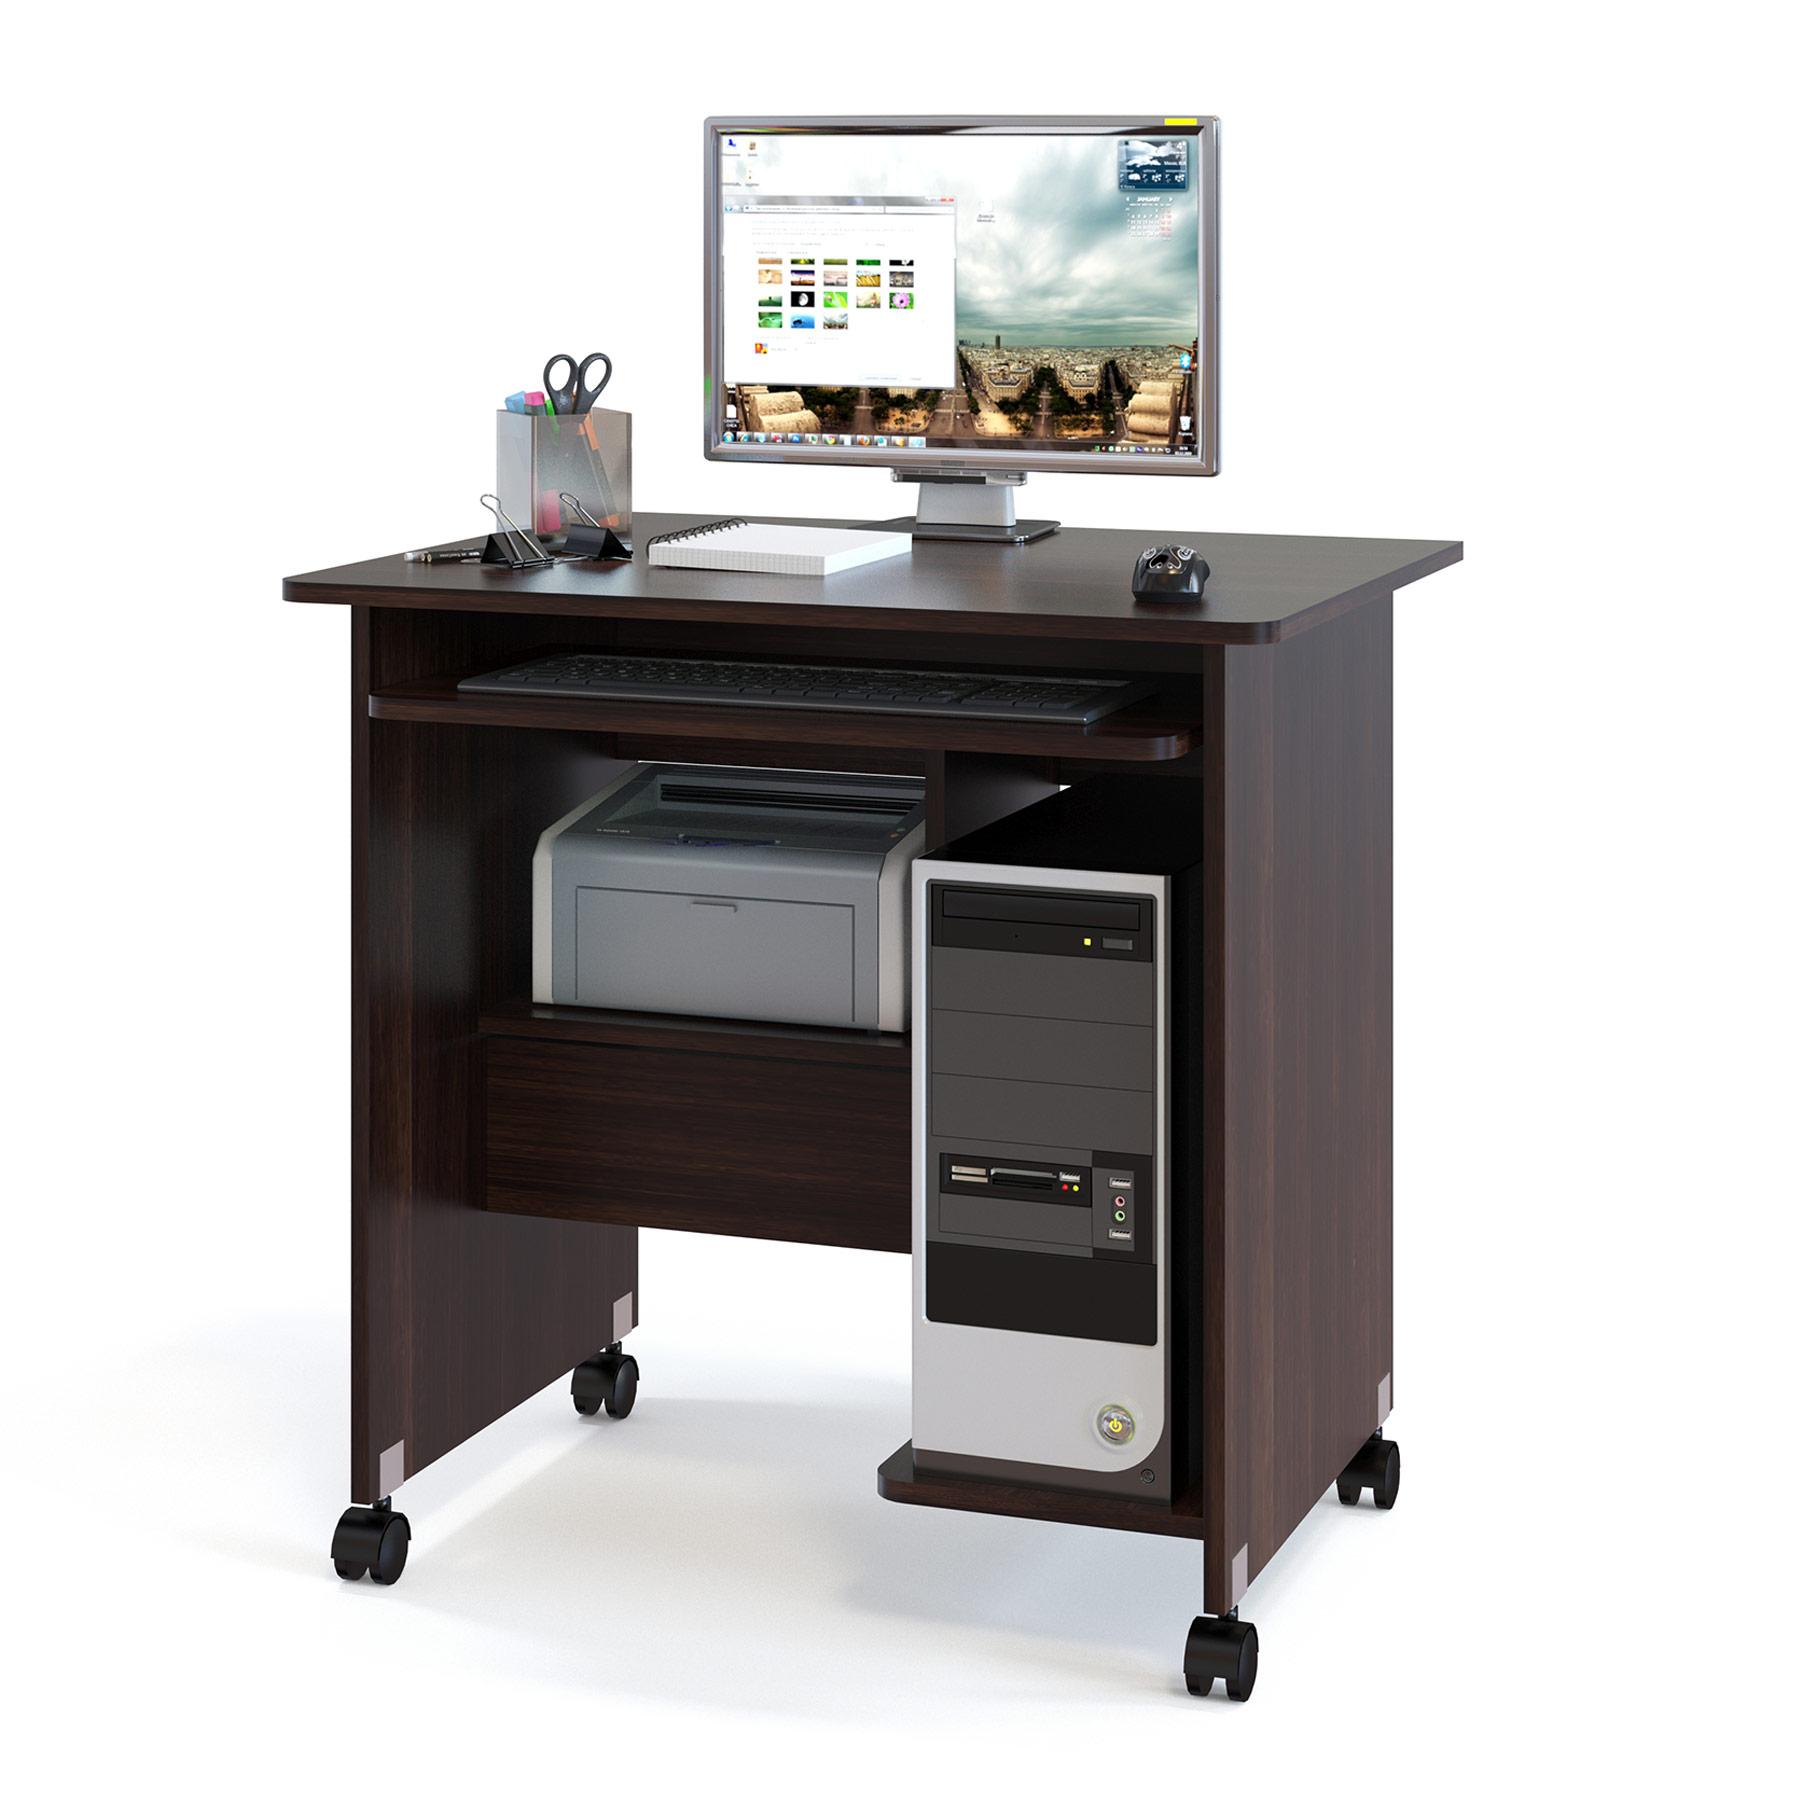 Компьютерный стол СОКОЛ КСТ-10.1 80x60x80, дуб венге